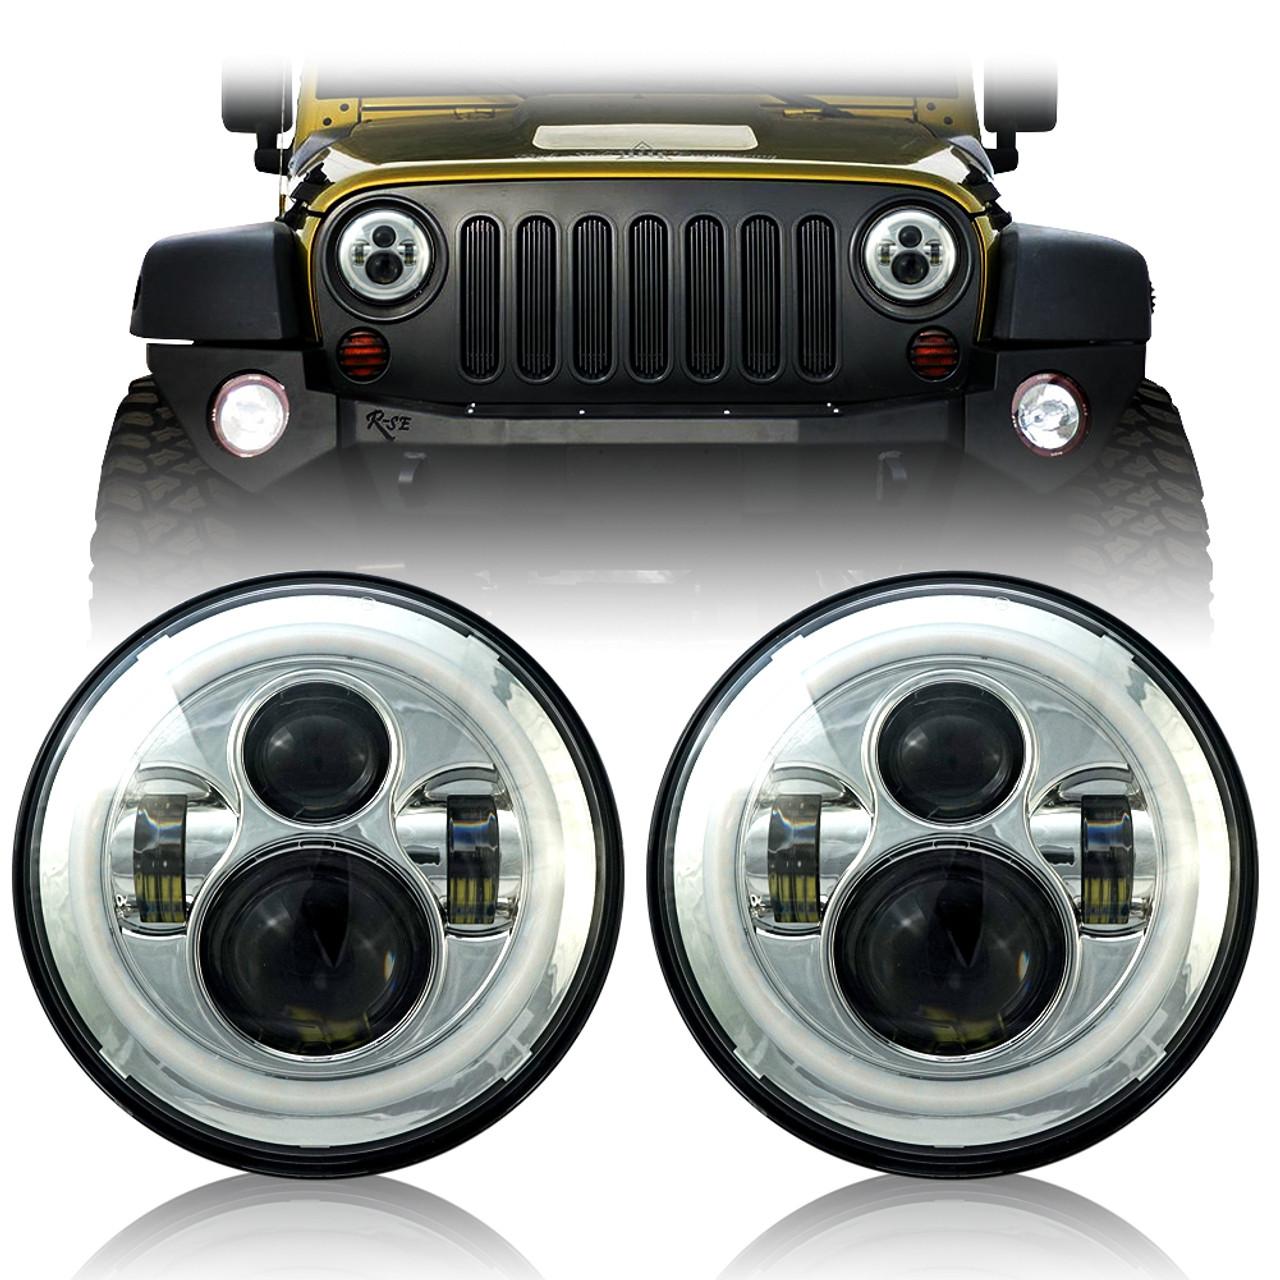 chrome housing halo headlights for wrangler [ 1280 x 1280 Pixel ]